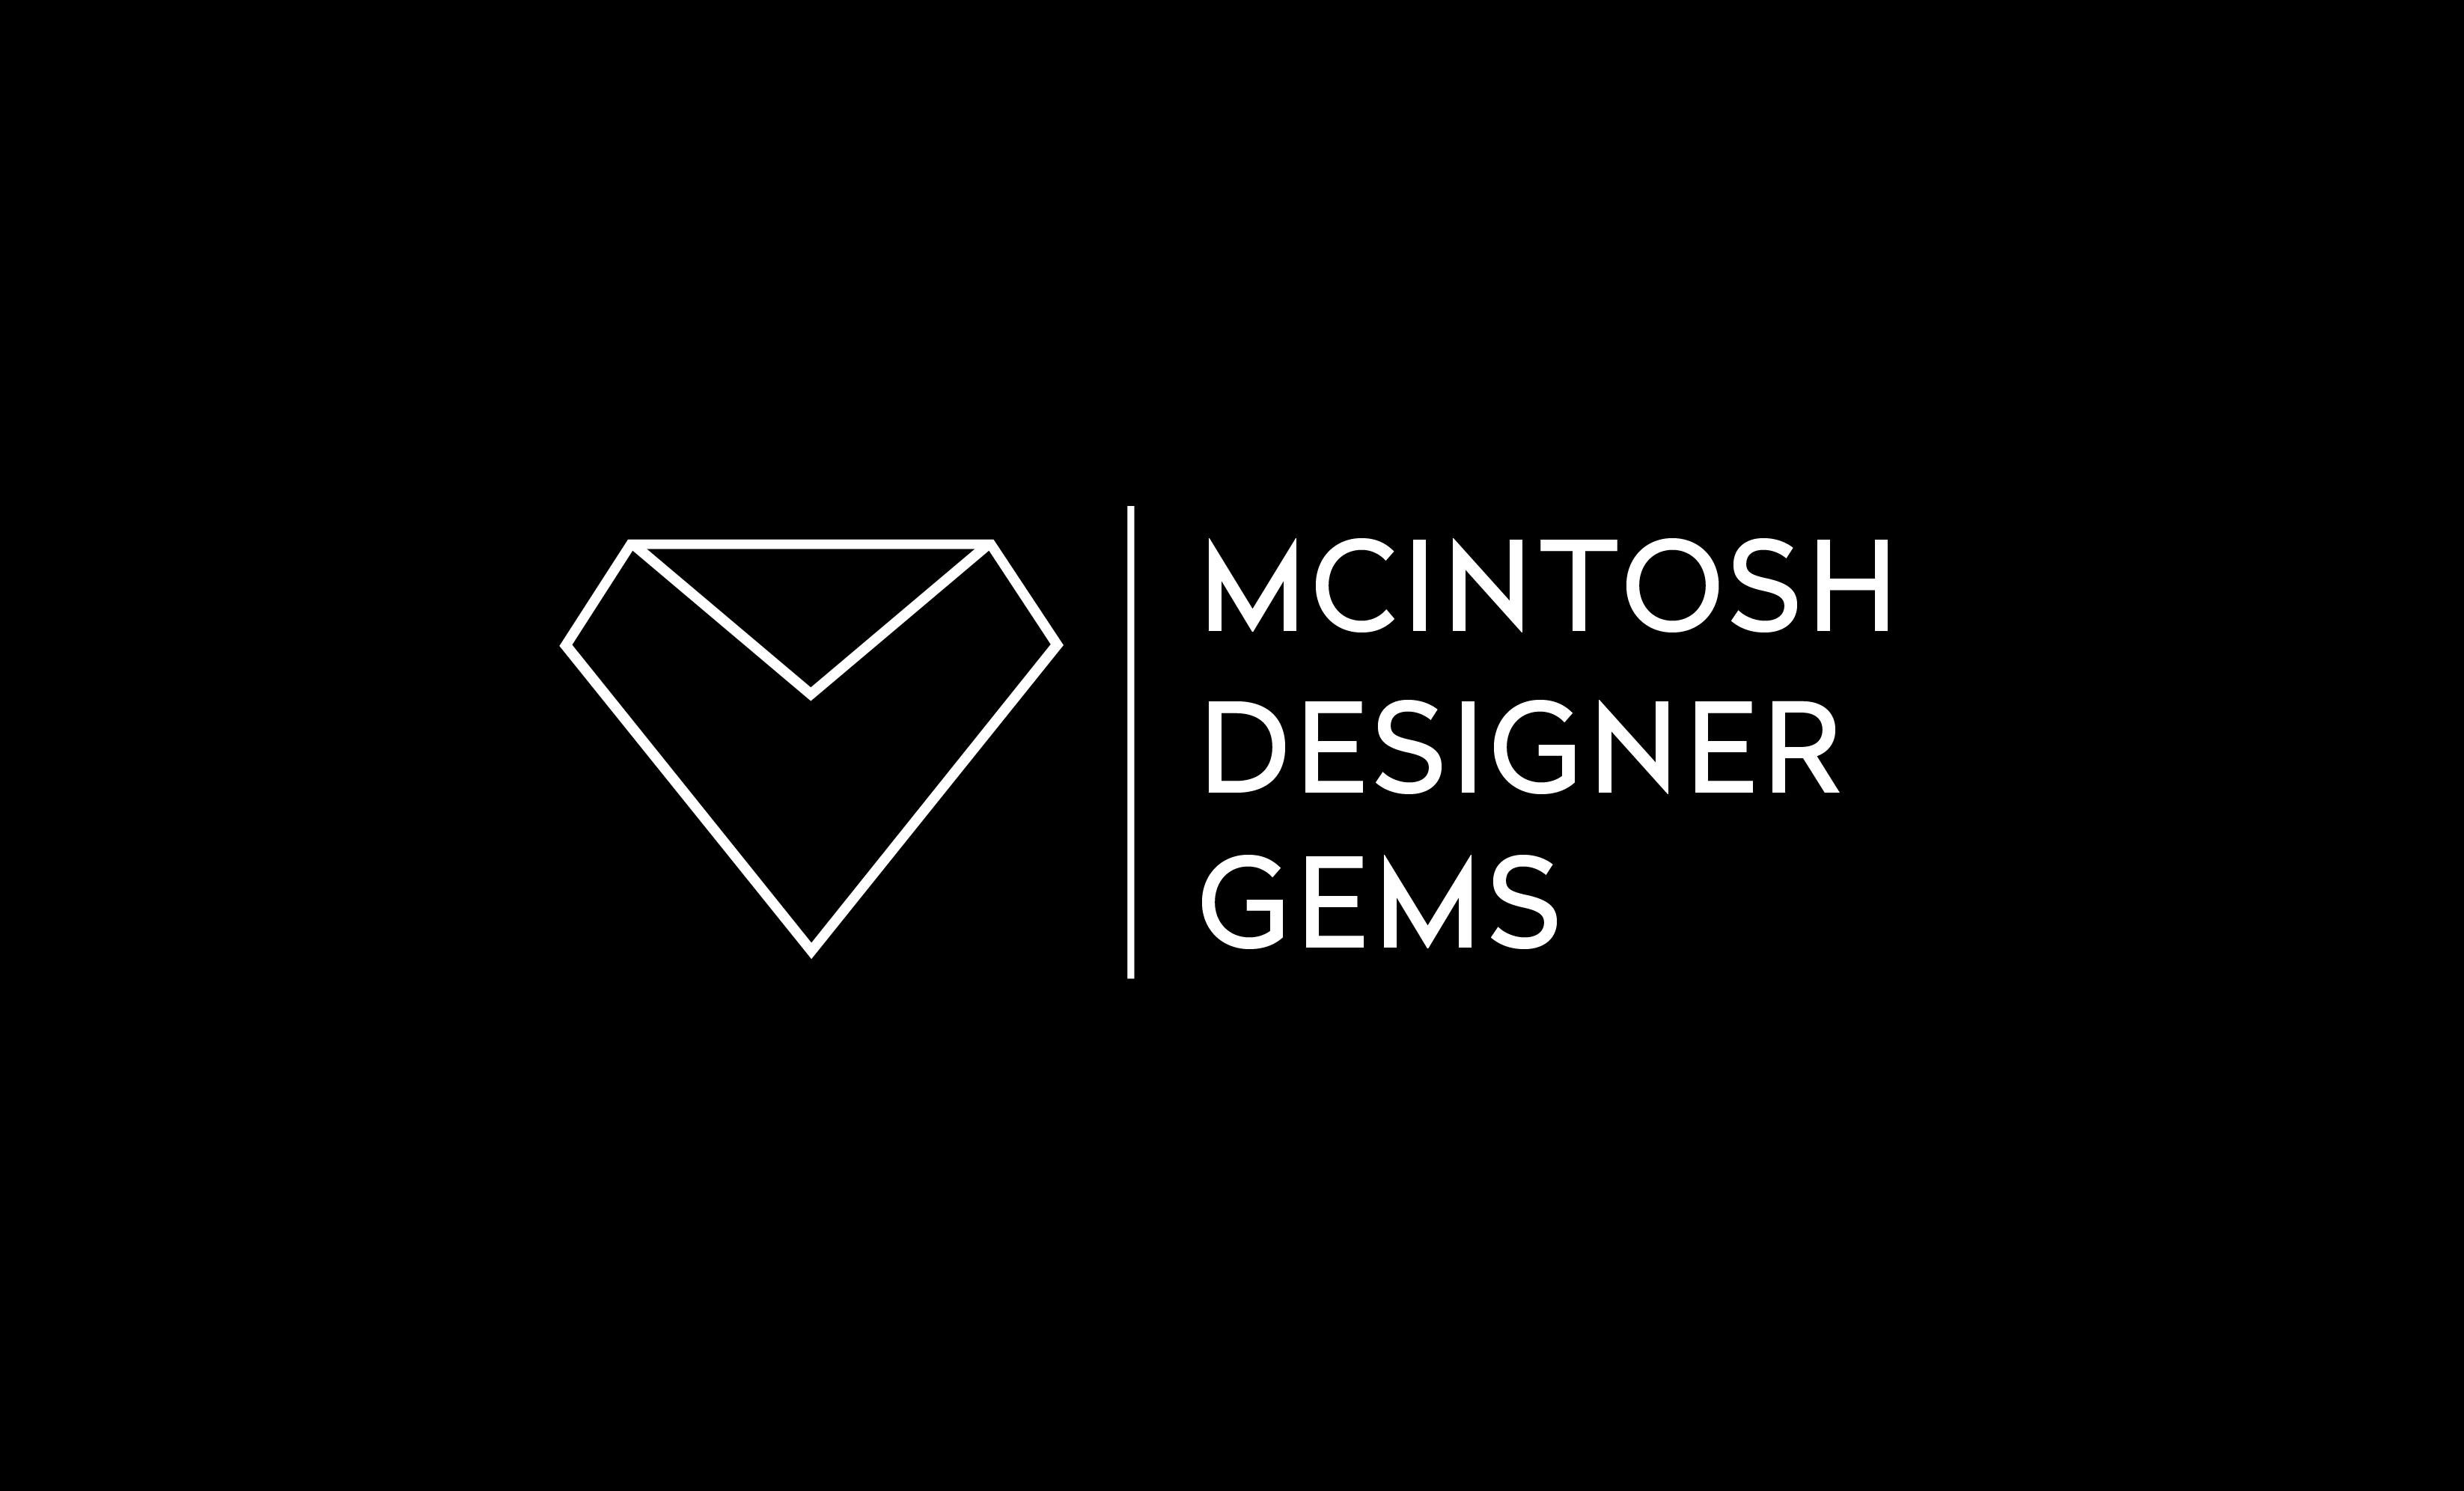 McIntosh_Designer_Gems (2)